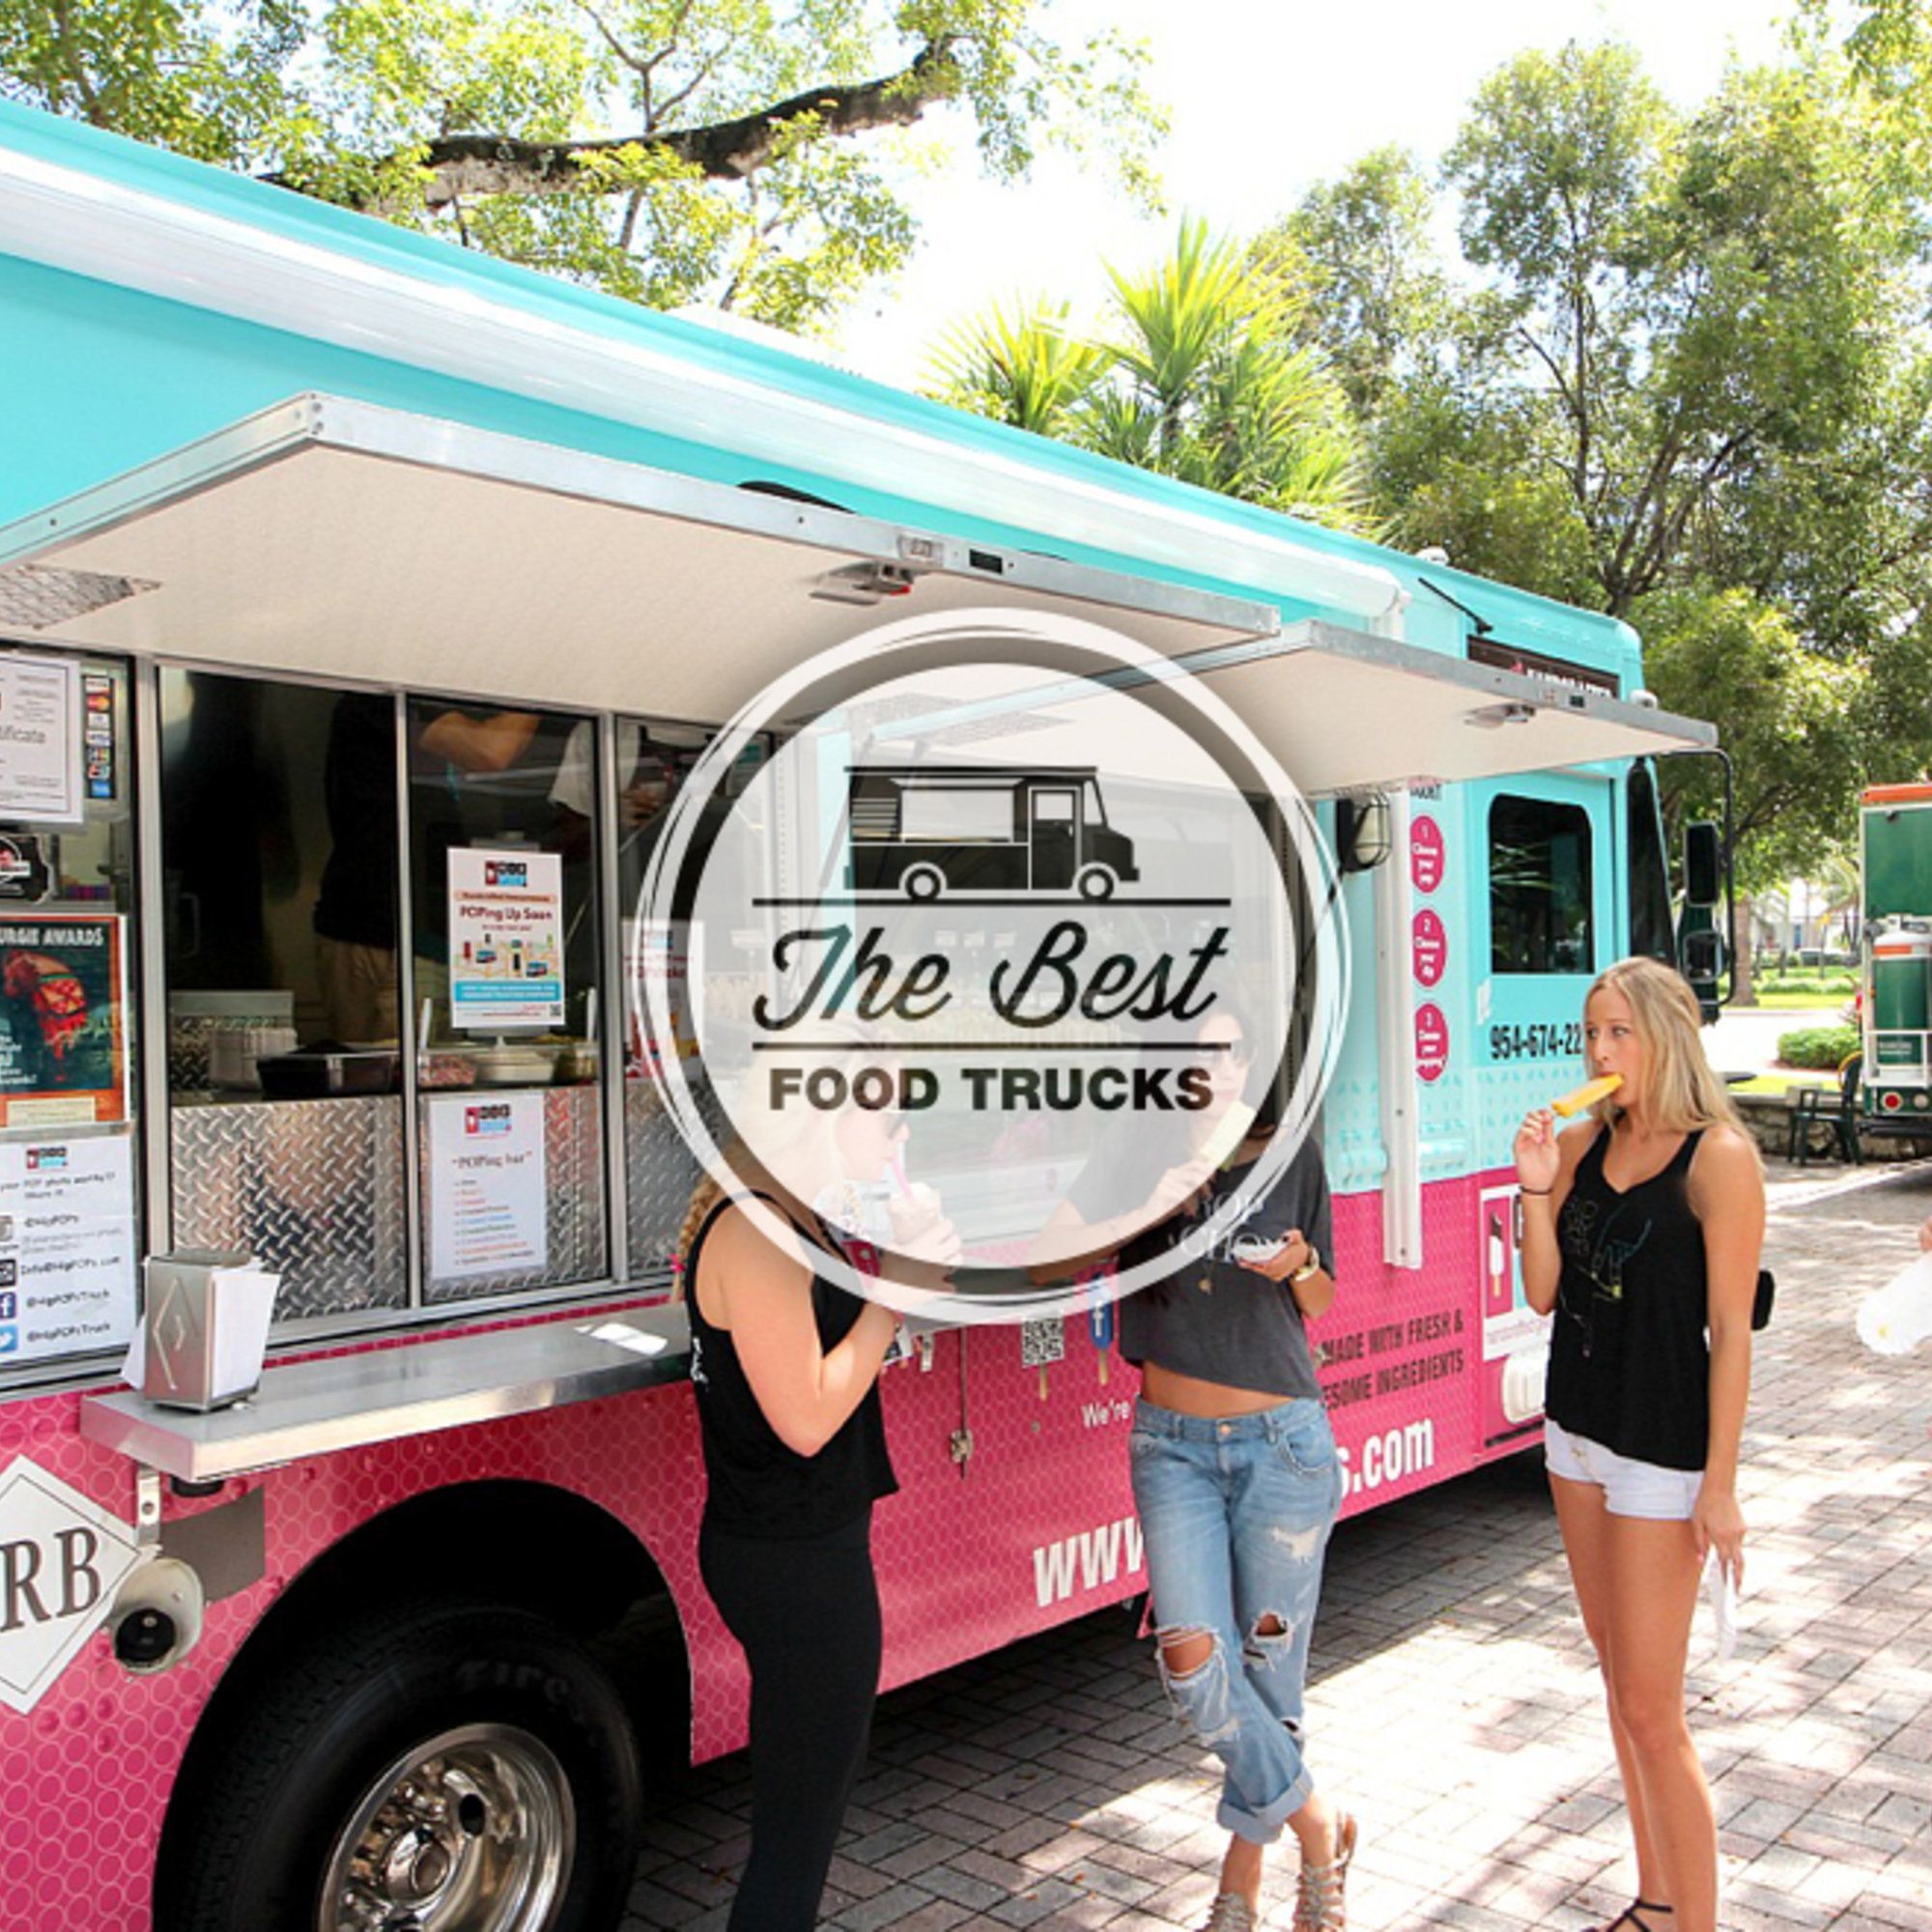 Best 25 food trucks miami ideas on pinterest nom nom food truck best food trucks and nom nom truck